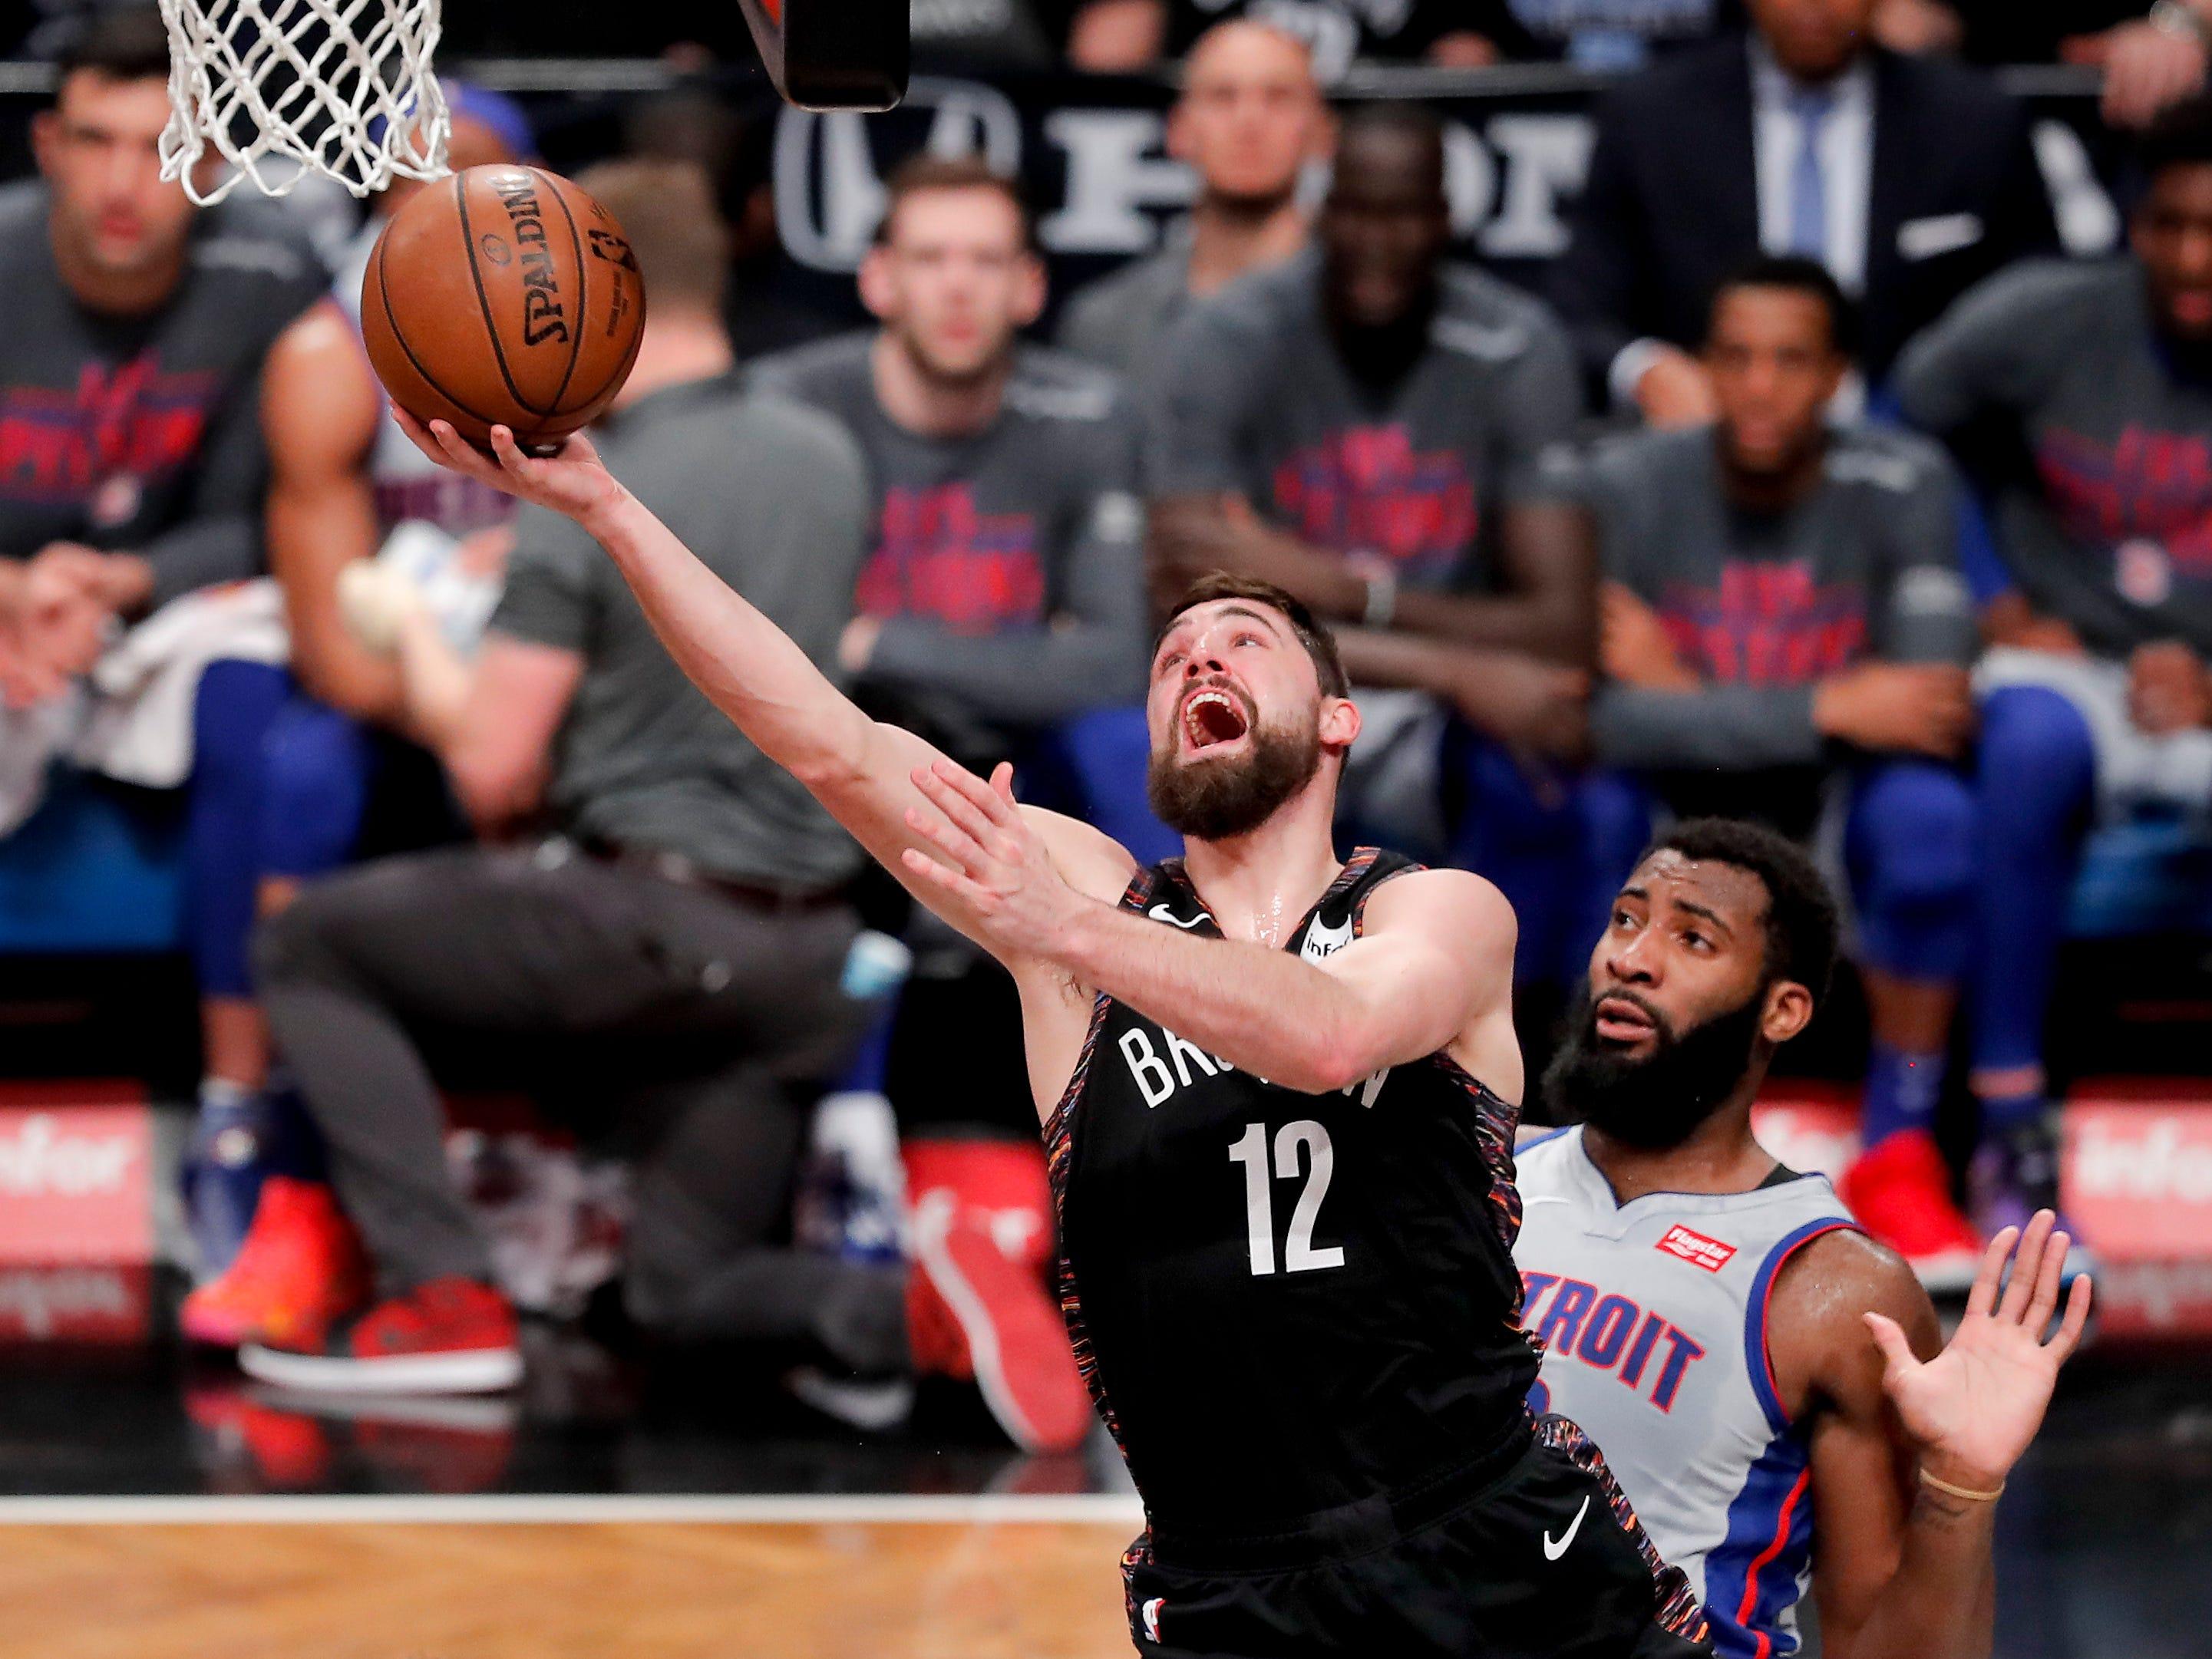 Brooklyn Nets forward Joe Harris (12) puts up a shot against Detroit Pistons center Andre Drummond (0) during the third quarter.